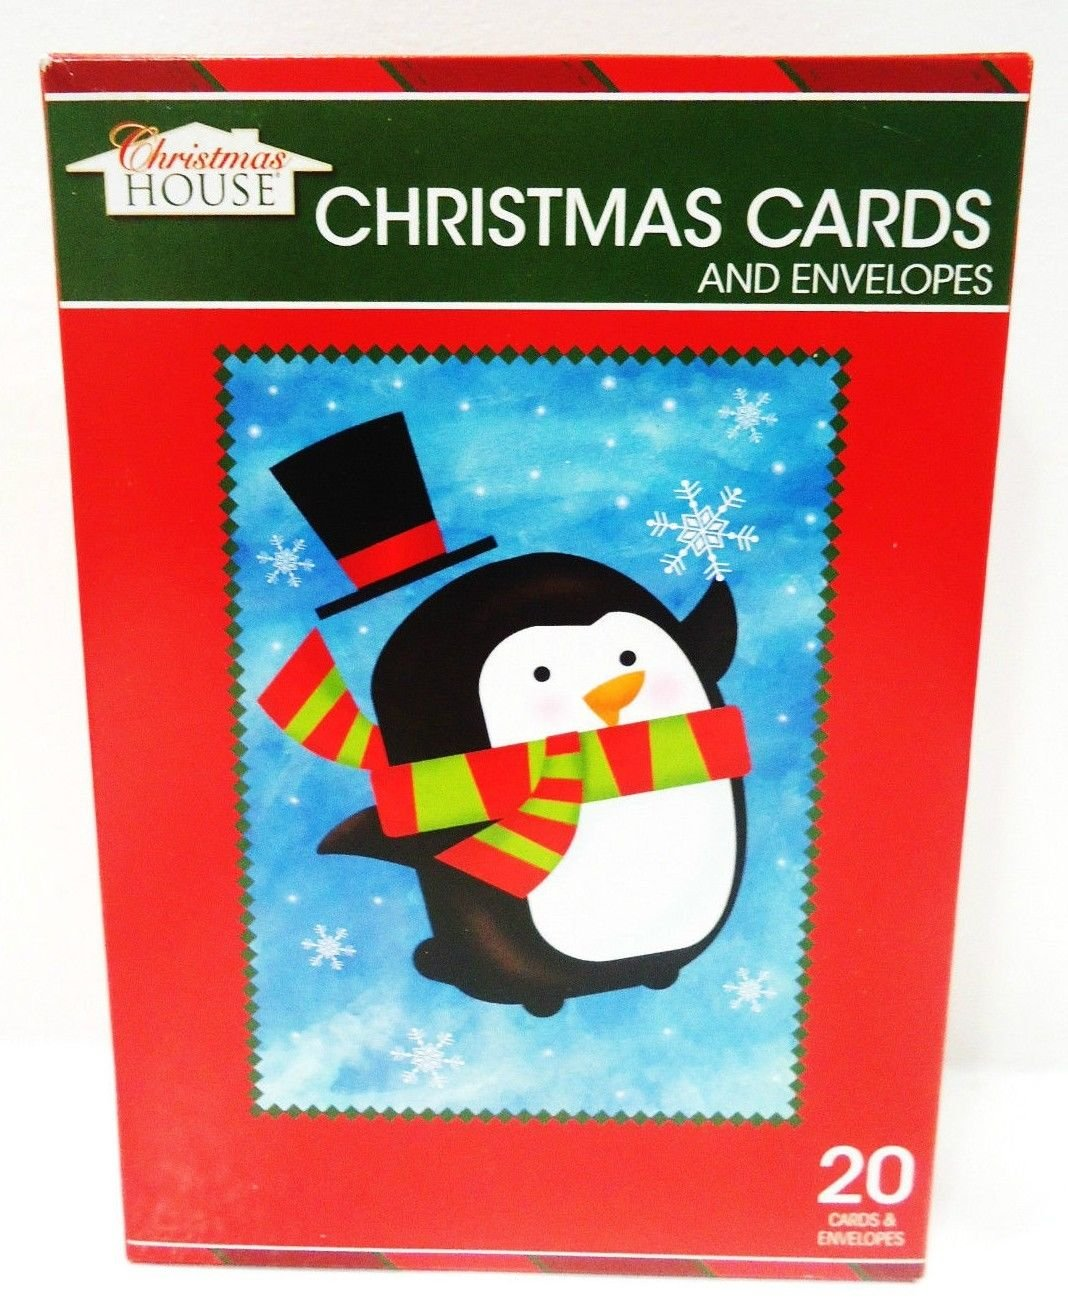 HOME ELEMENTS - 20 PCS. - CHRISTMAS - CARDS - ENVELOPES - BOXED - SET - NEW - #1